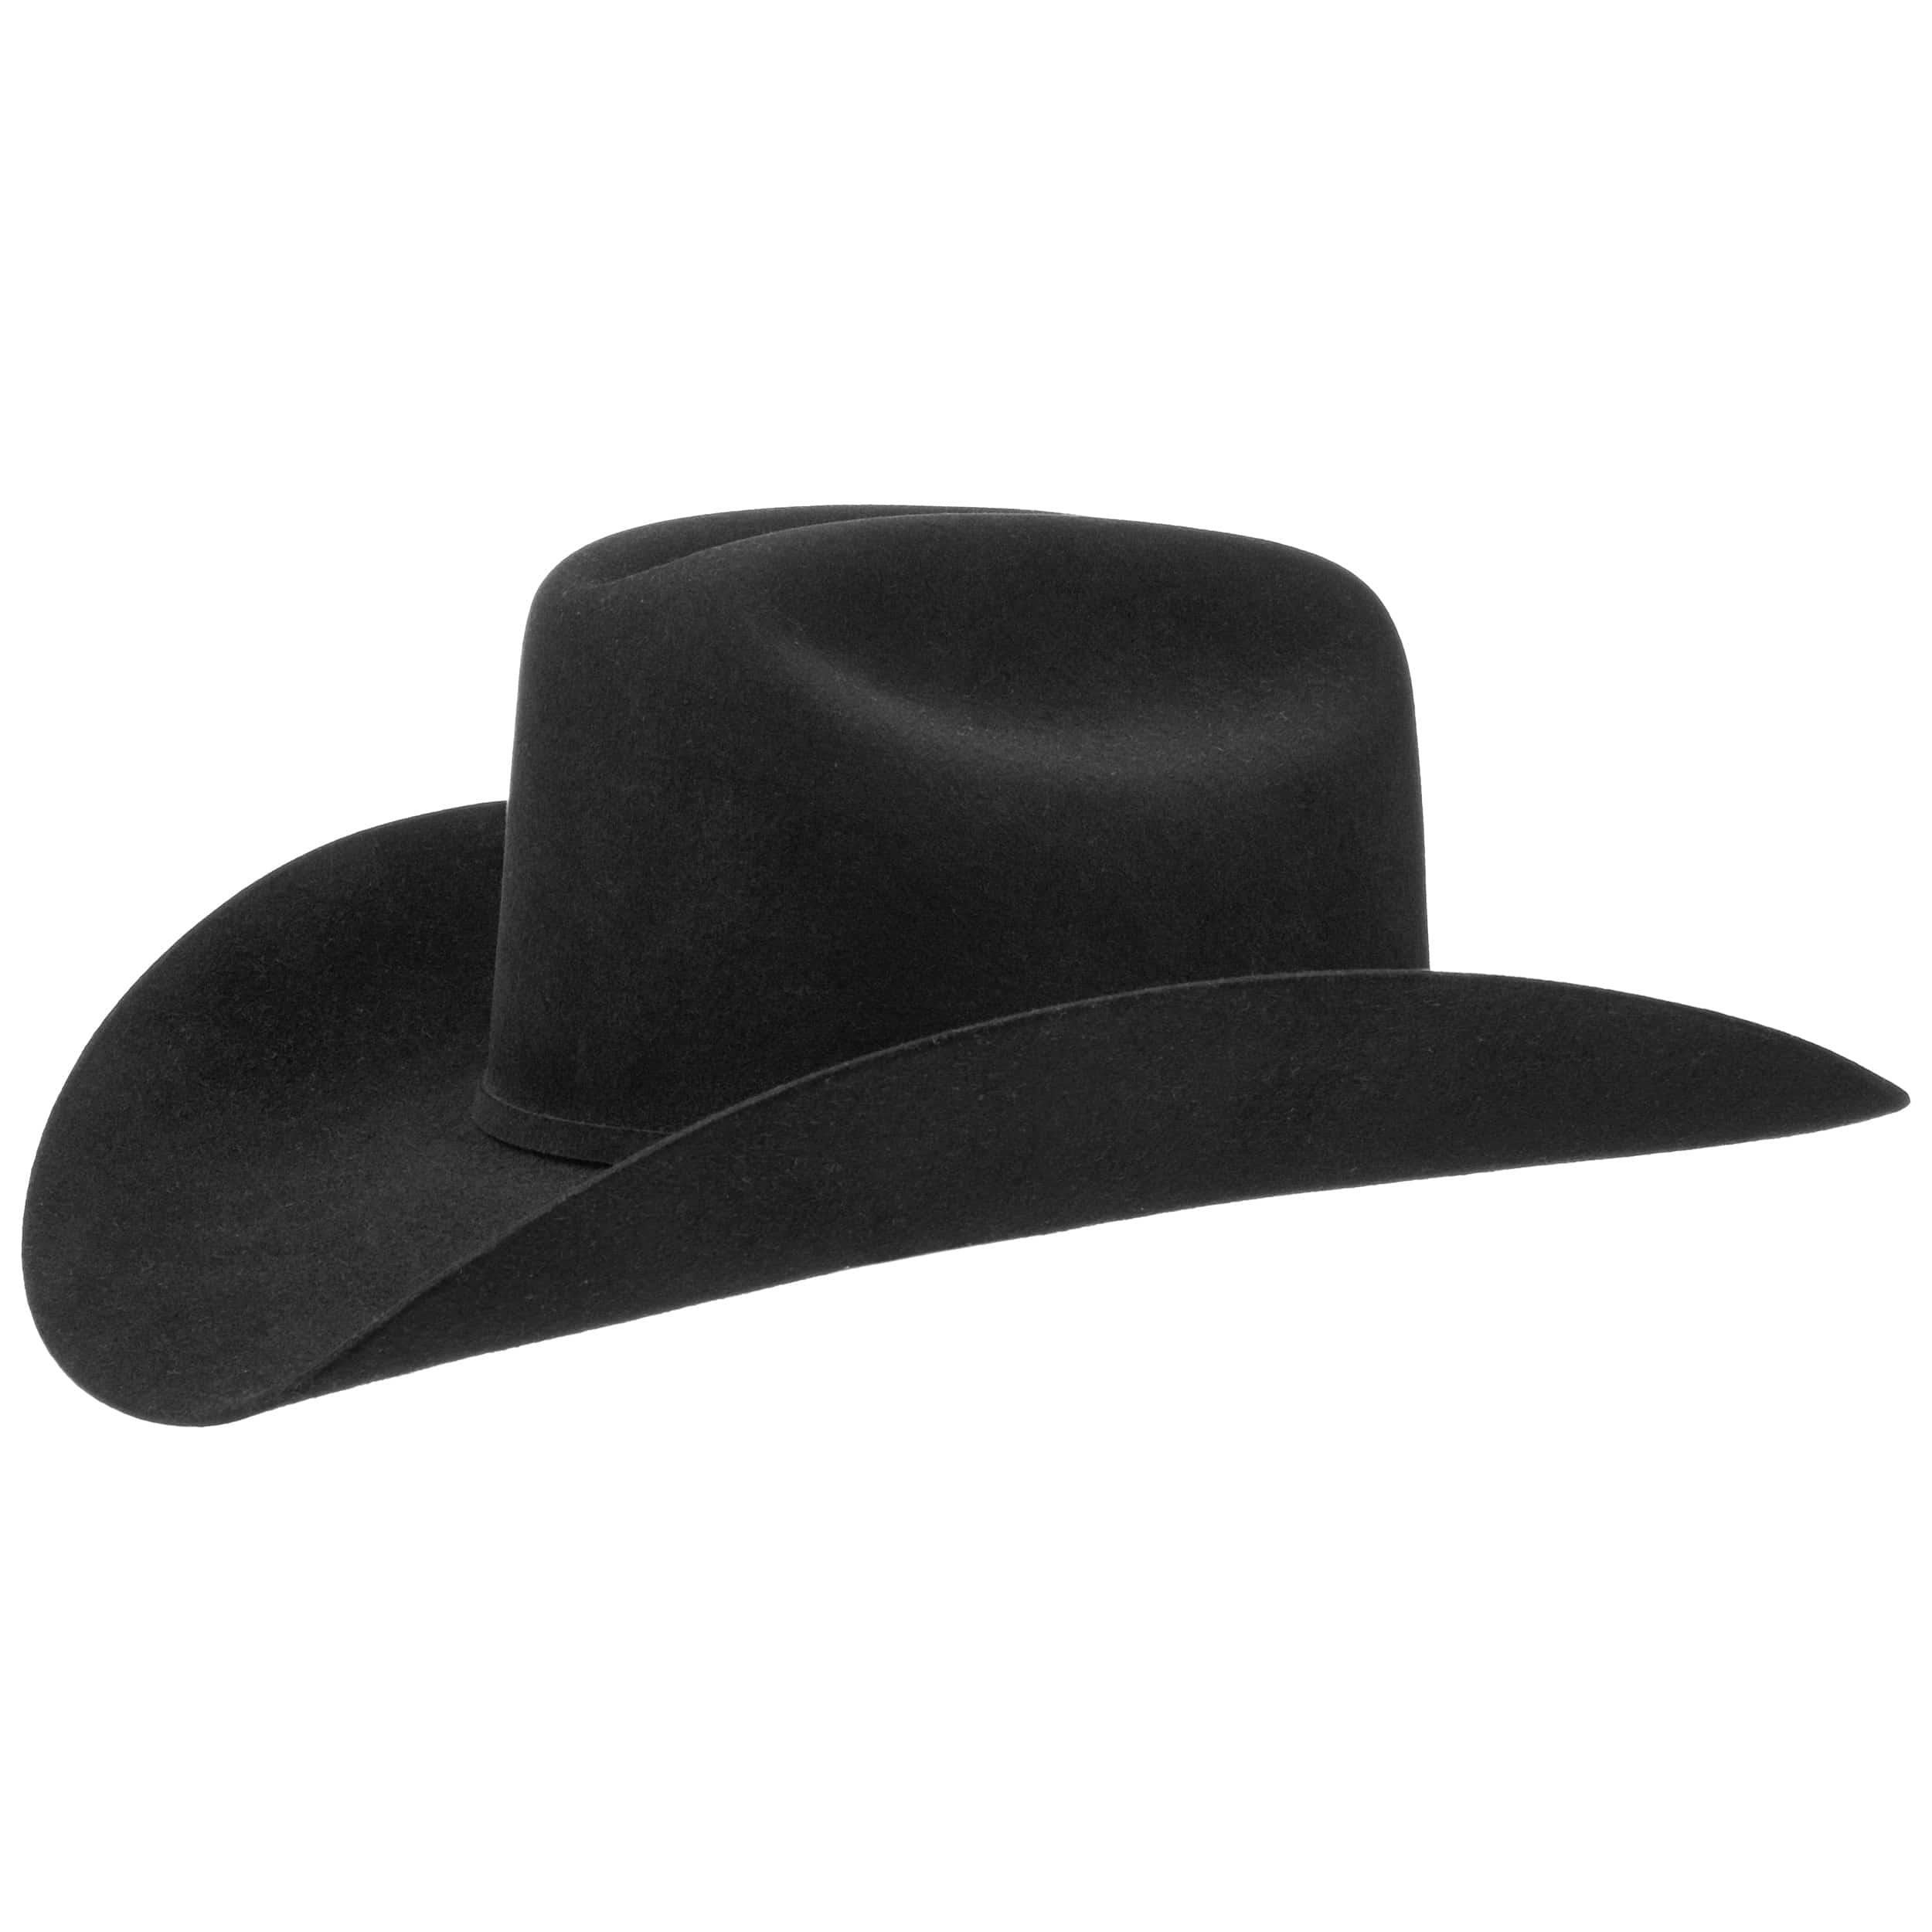 17e2eaaaeaf28 ... Lariat 5X Fur Felt Western Hat by Stetson - black 1 ...